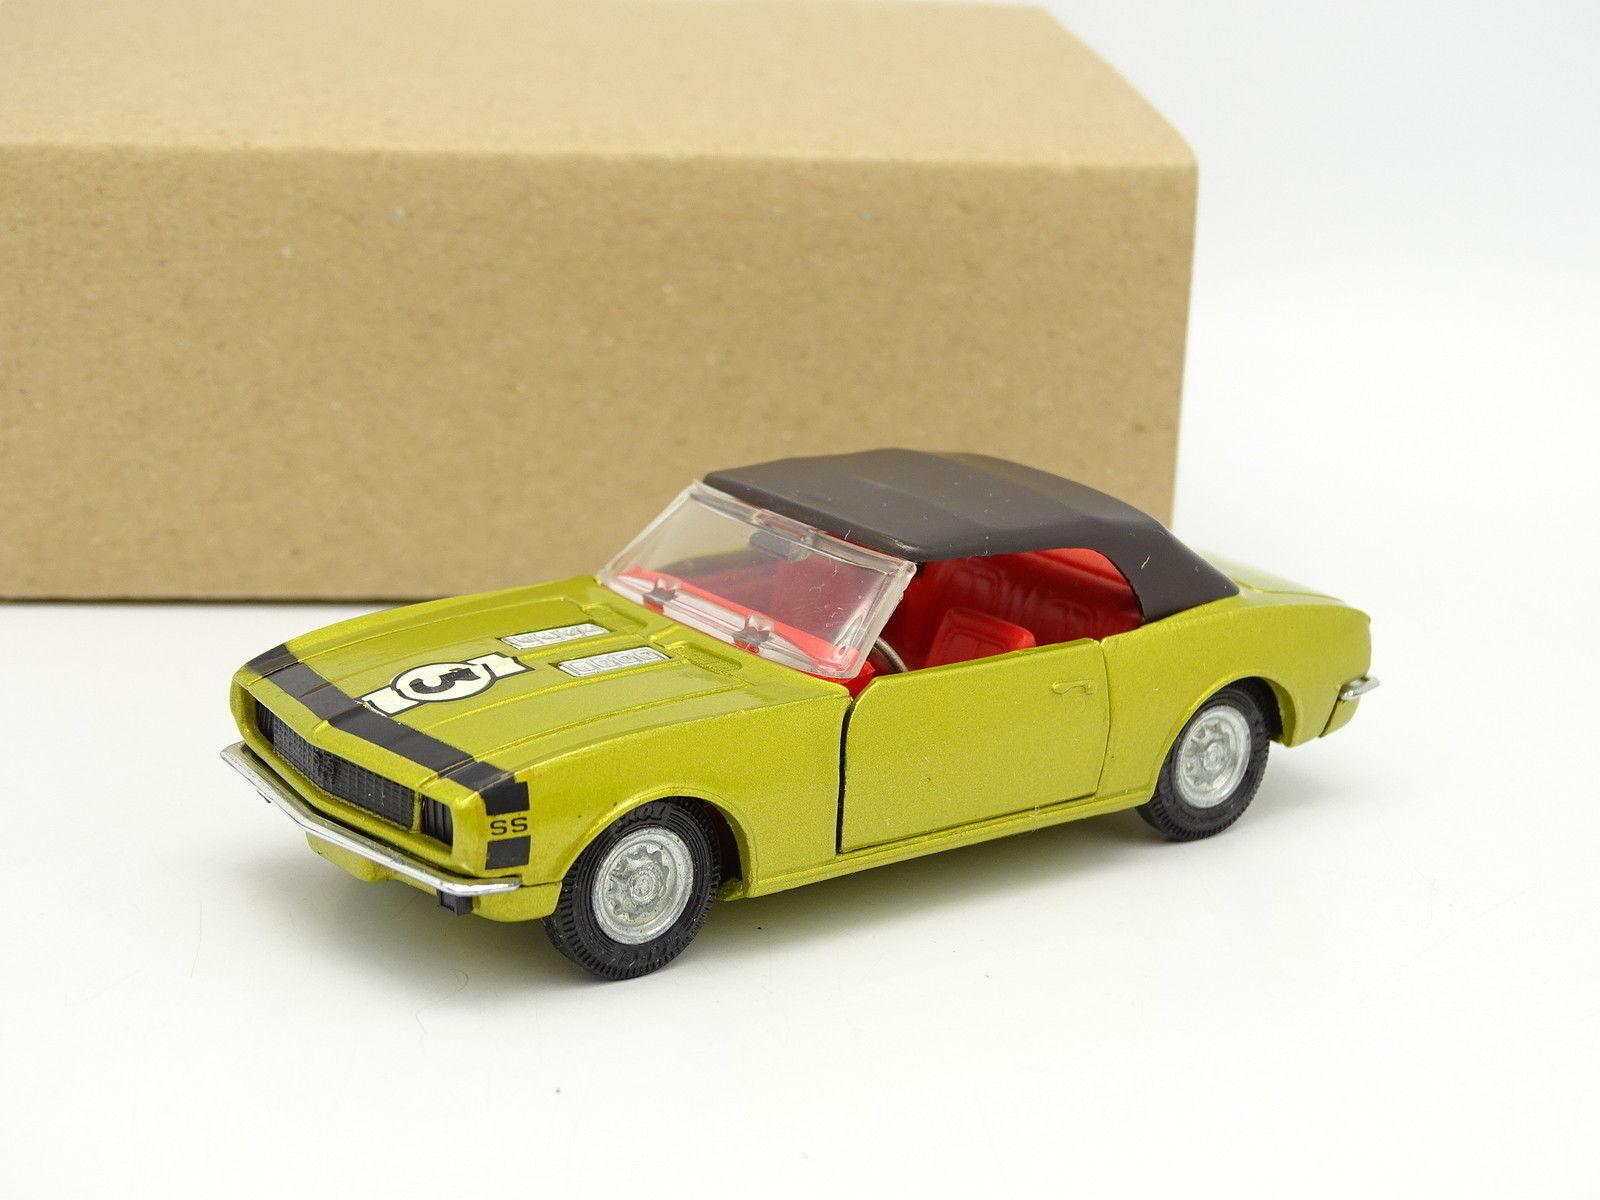 Corgi toys sb 1 43 - chevrolet camaro ss gold metal